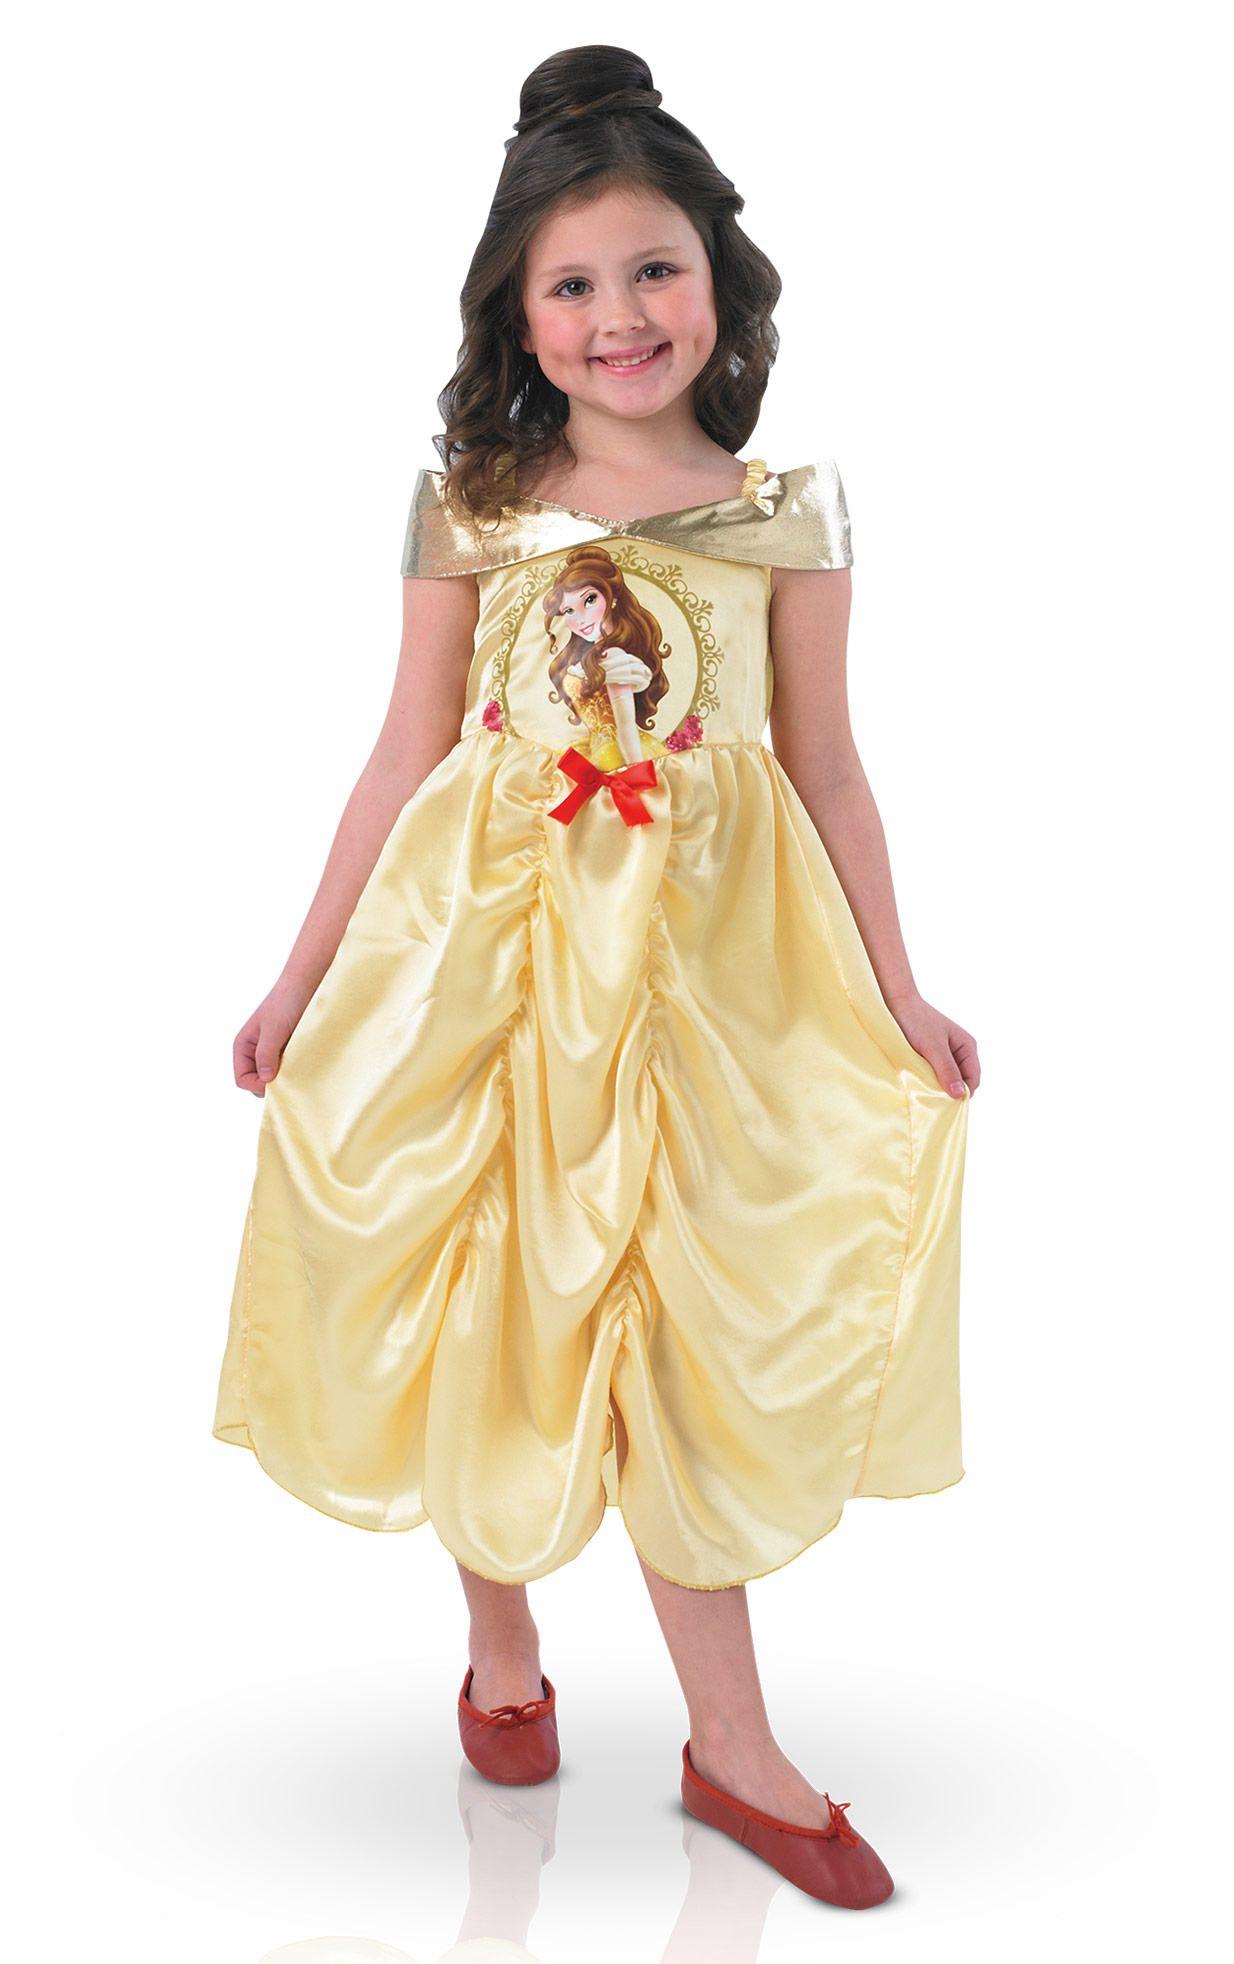 1c2afe97546af Déguisement classique Storytime Belle™ fille   Ce déguisement de Belle™  pour fille est sous